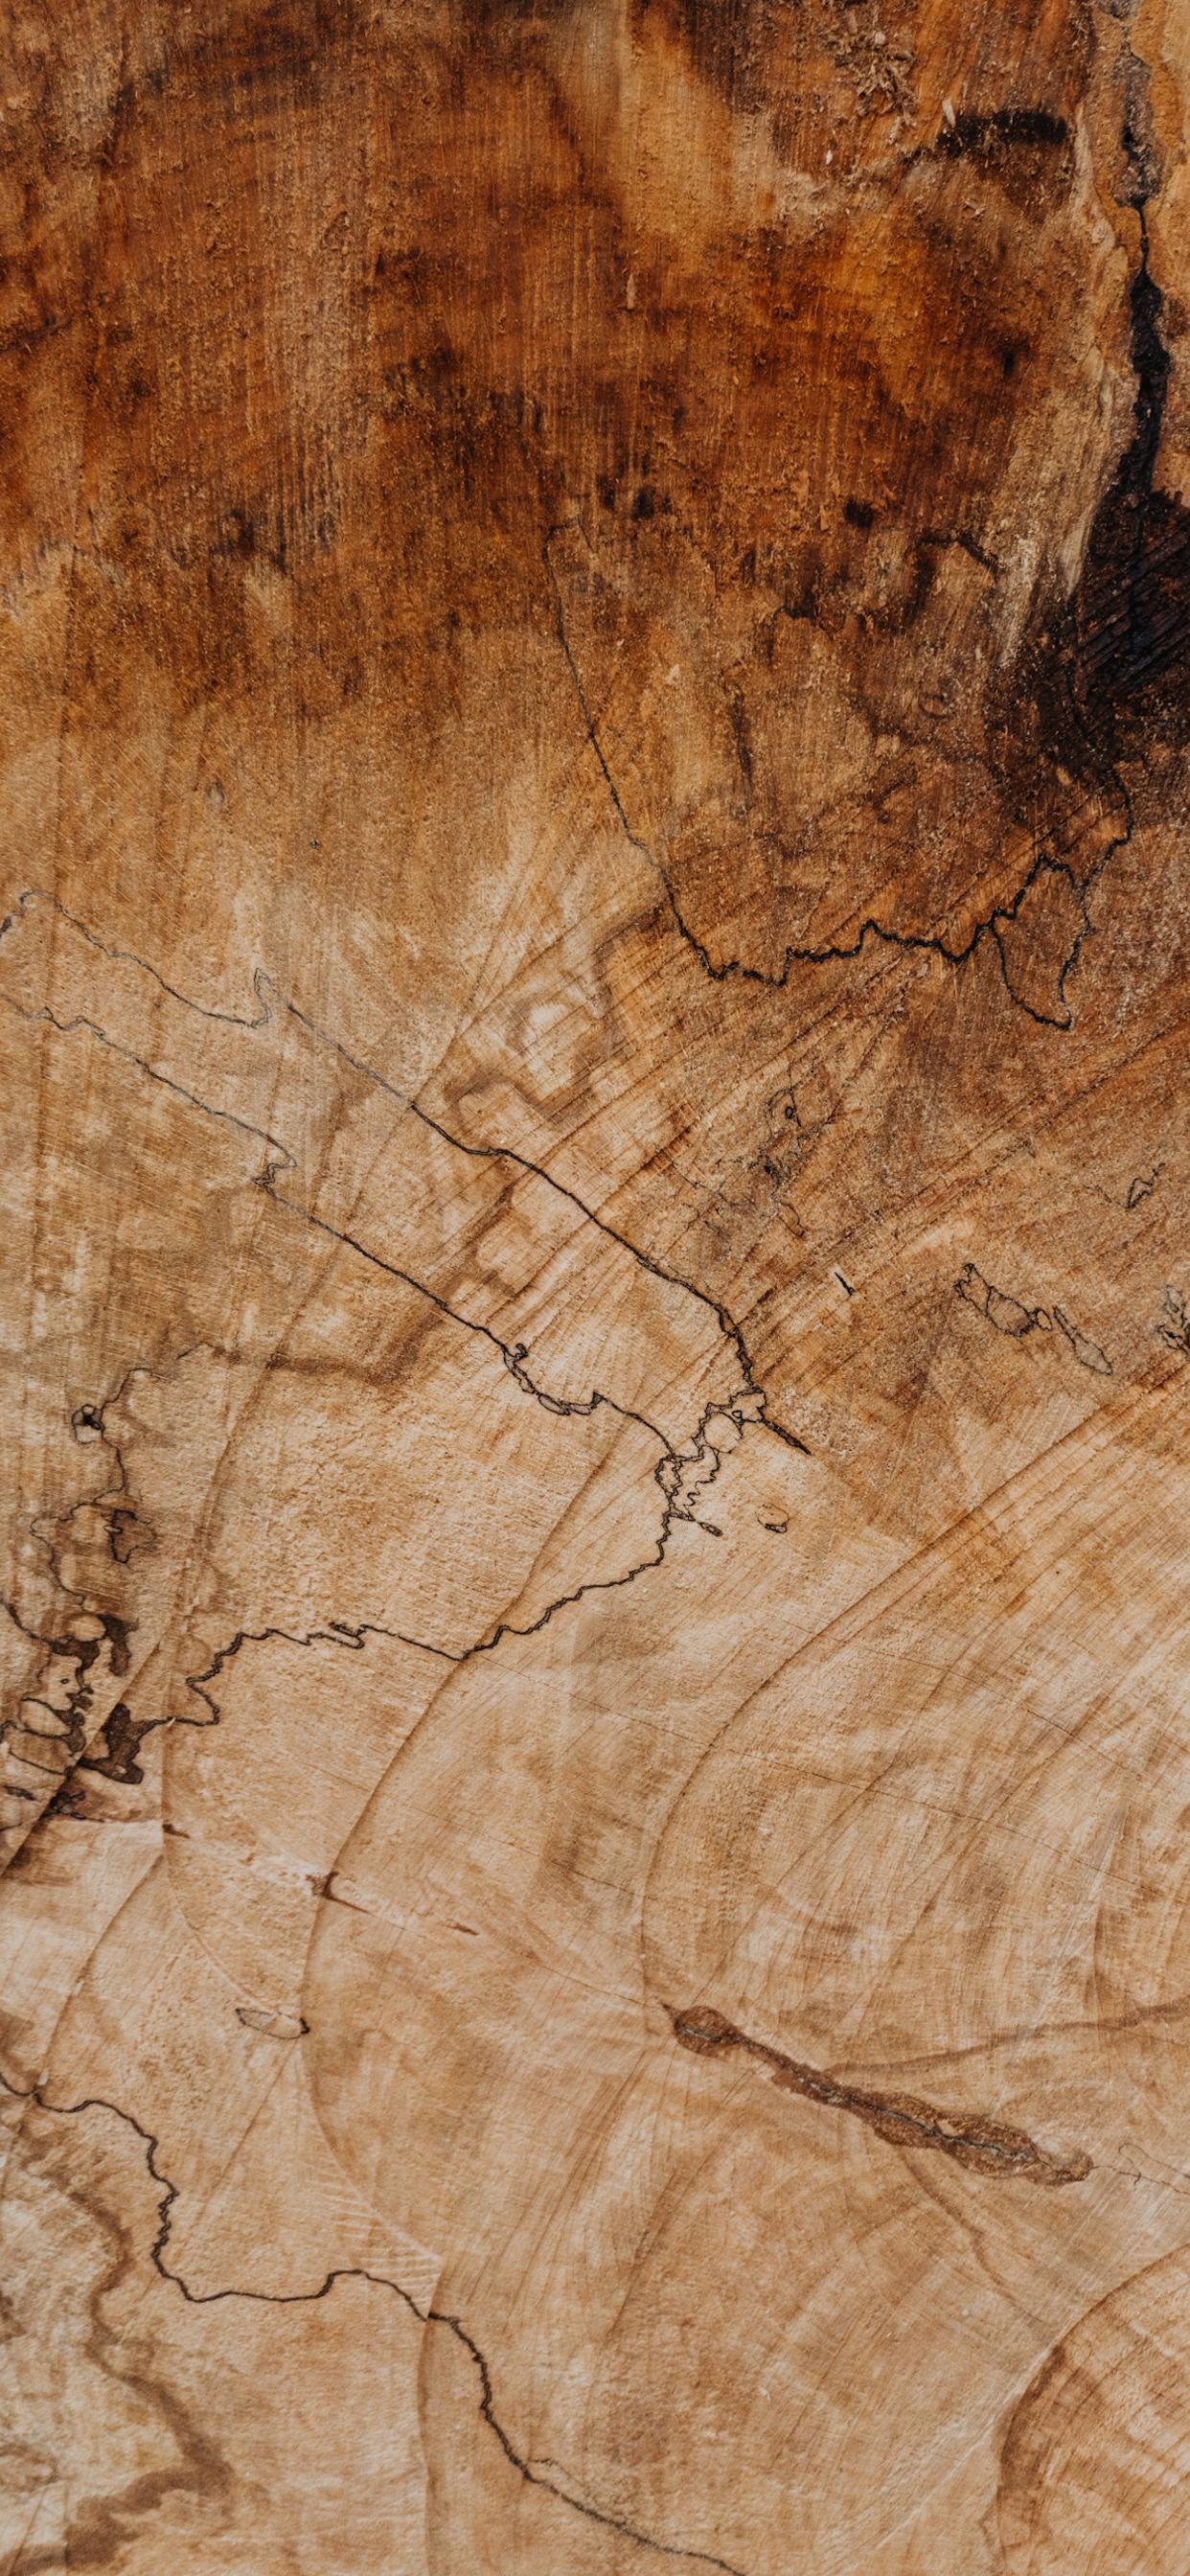 iPhone wallpapers texture wood brown black surface Fonds d'écran iPhone du 06/03/2020